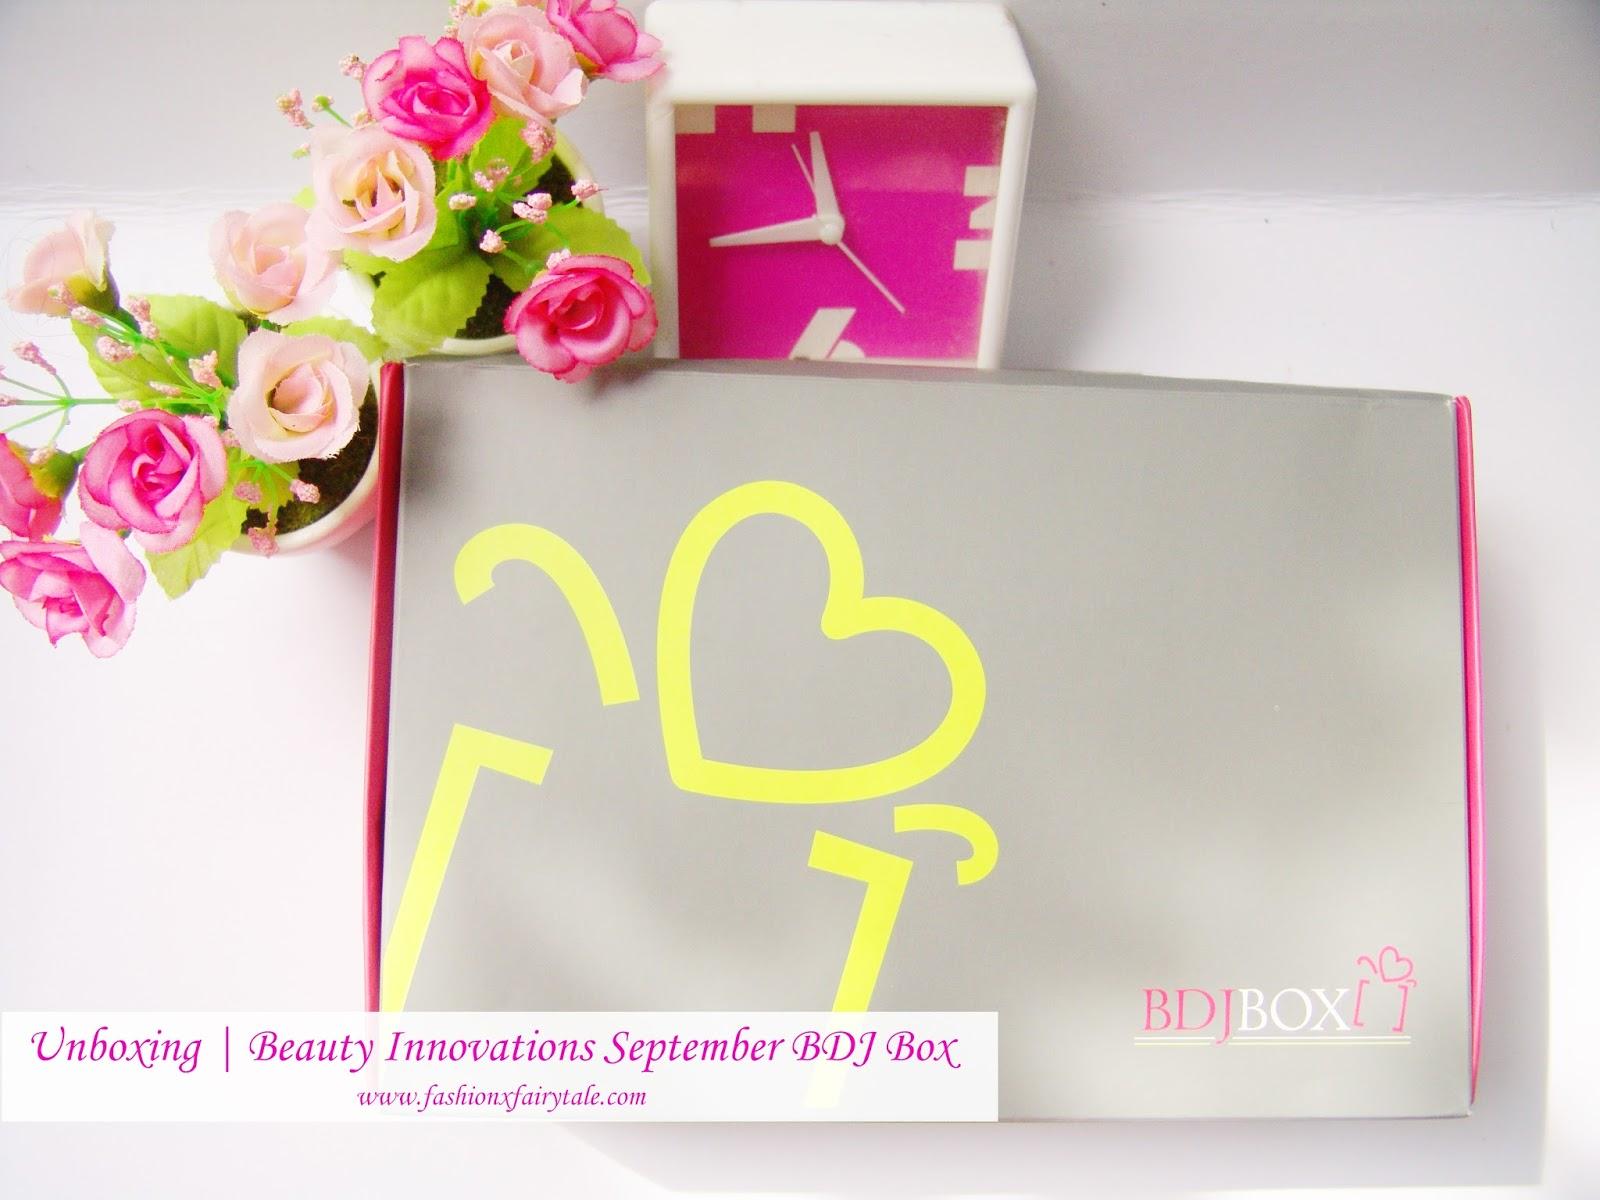 Unboxing | Beauty Innovations September BDJ Box